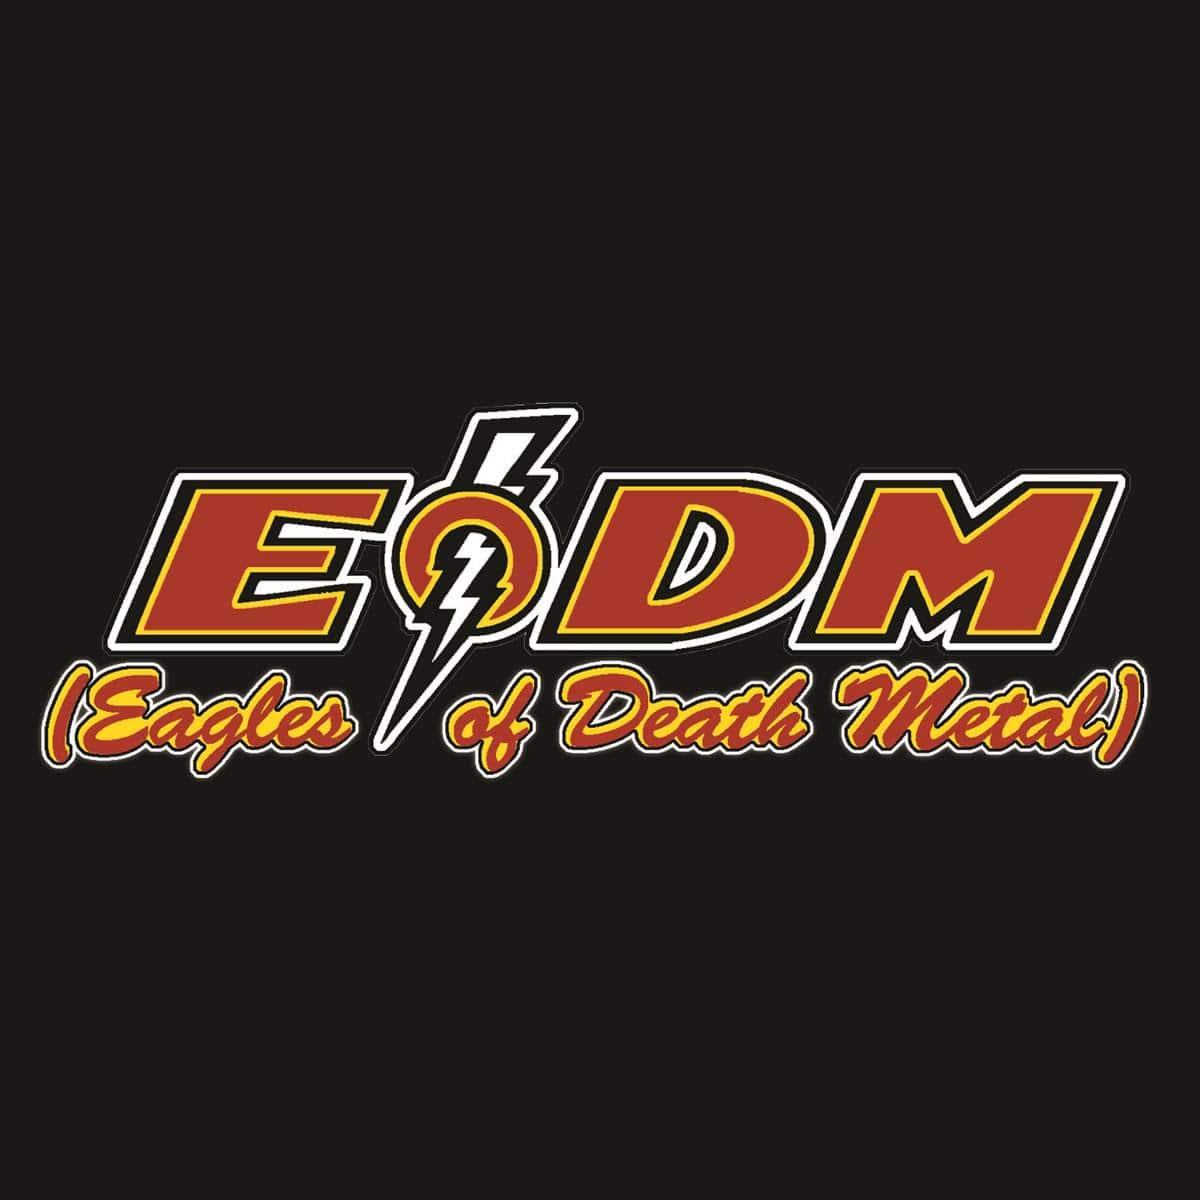 EAGLES OF DEATH METAL REVIENT